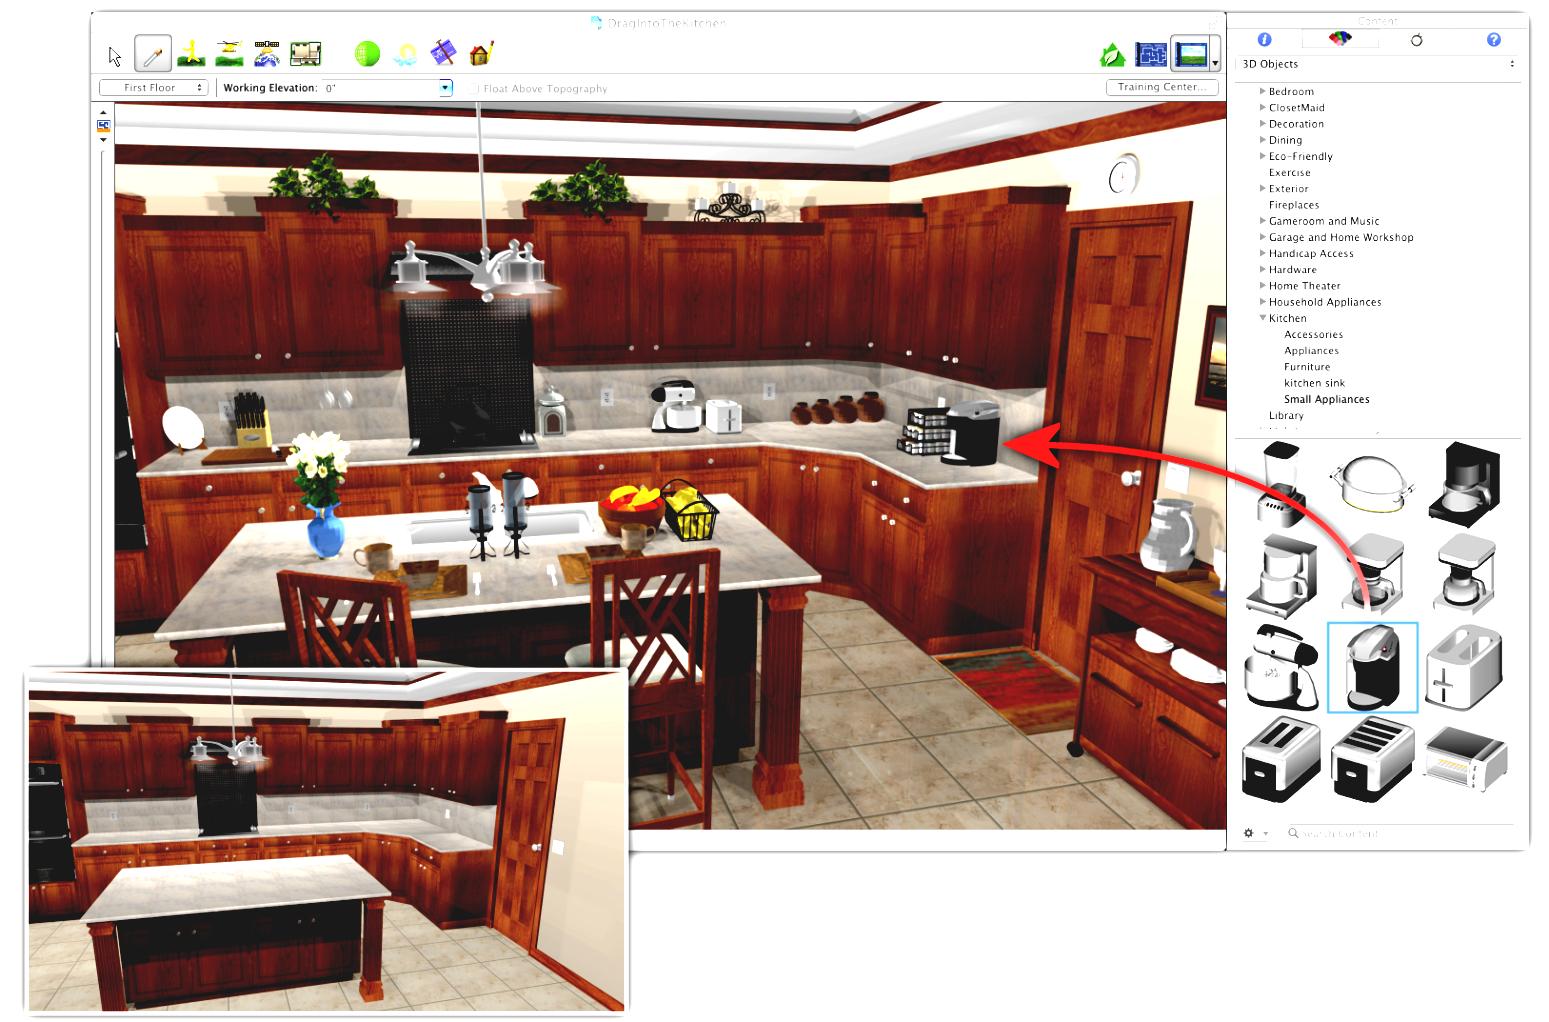 Home design studio software  review decor also homedecor rh in pinterest